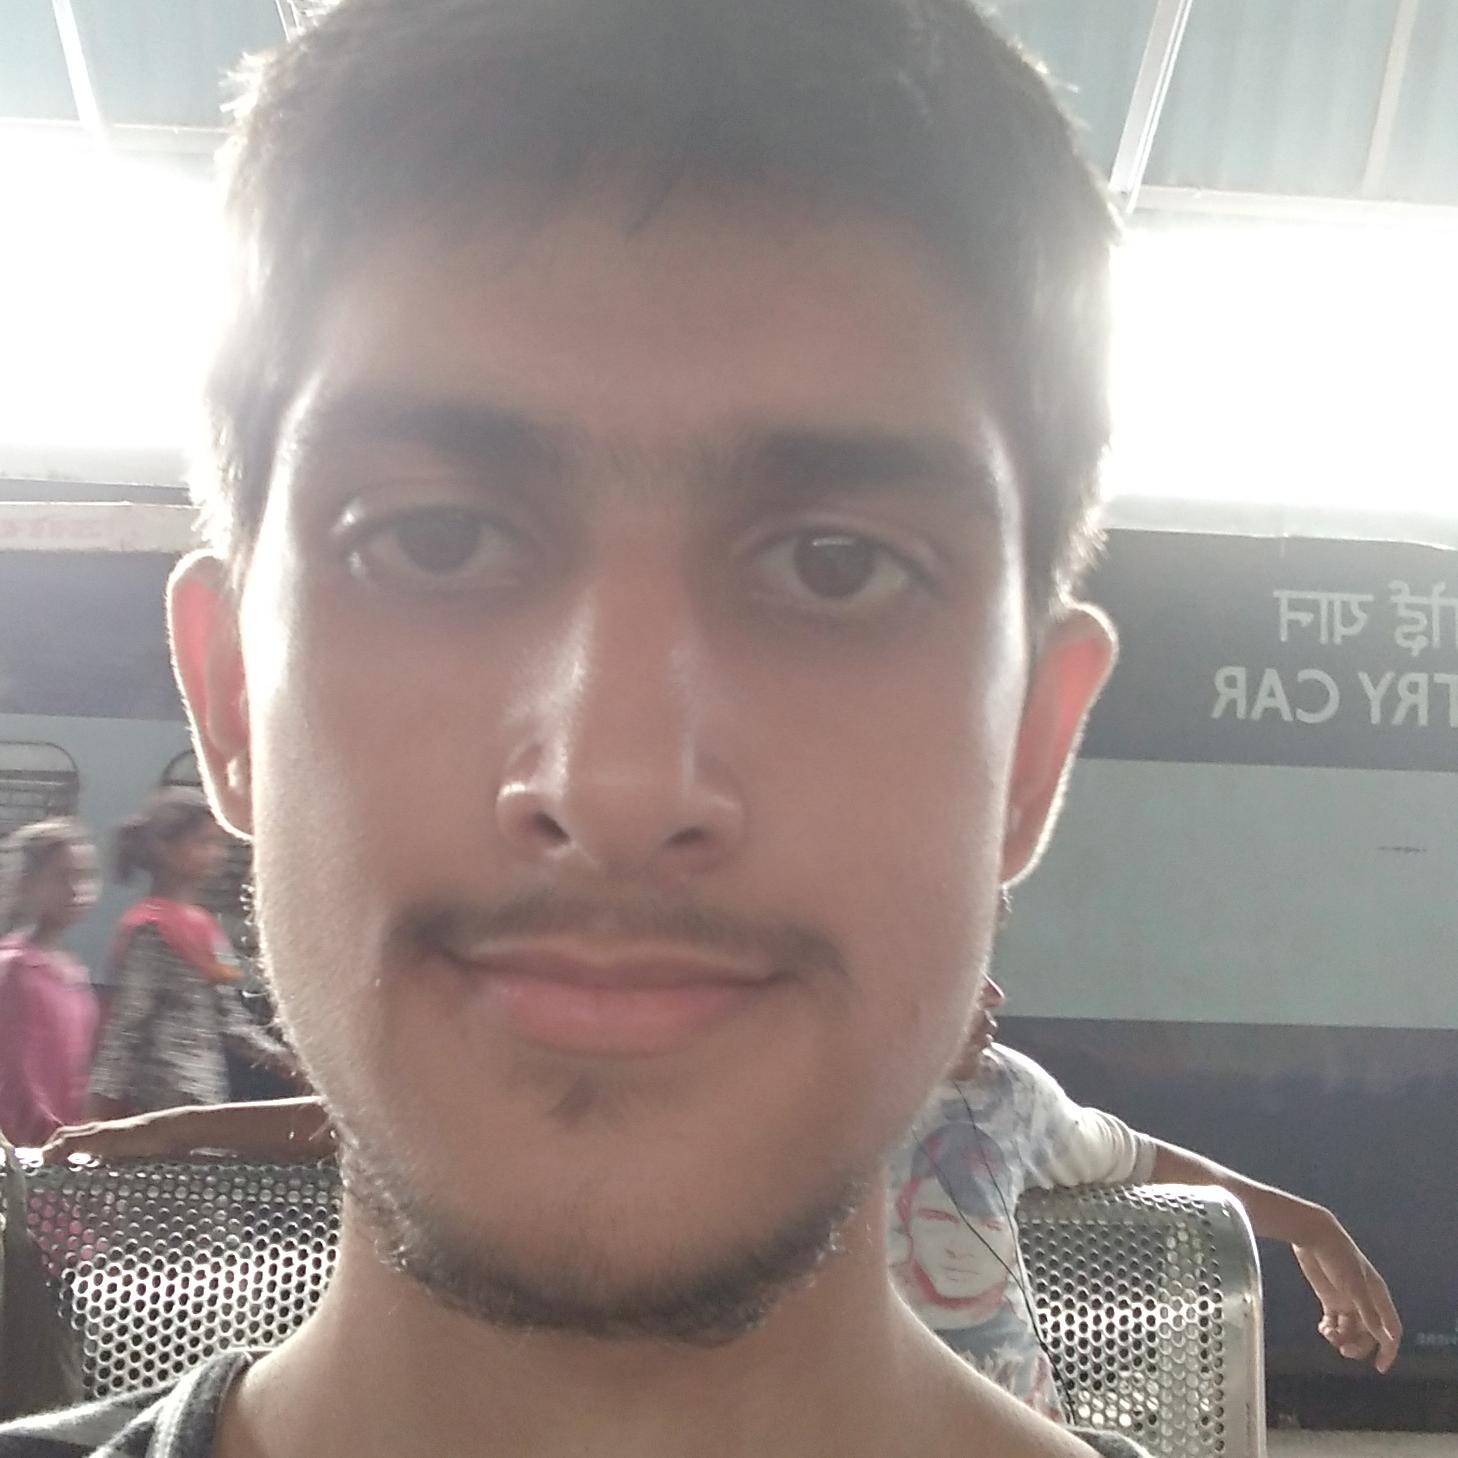 Nitish Menghani